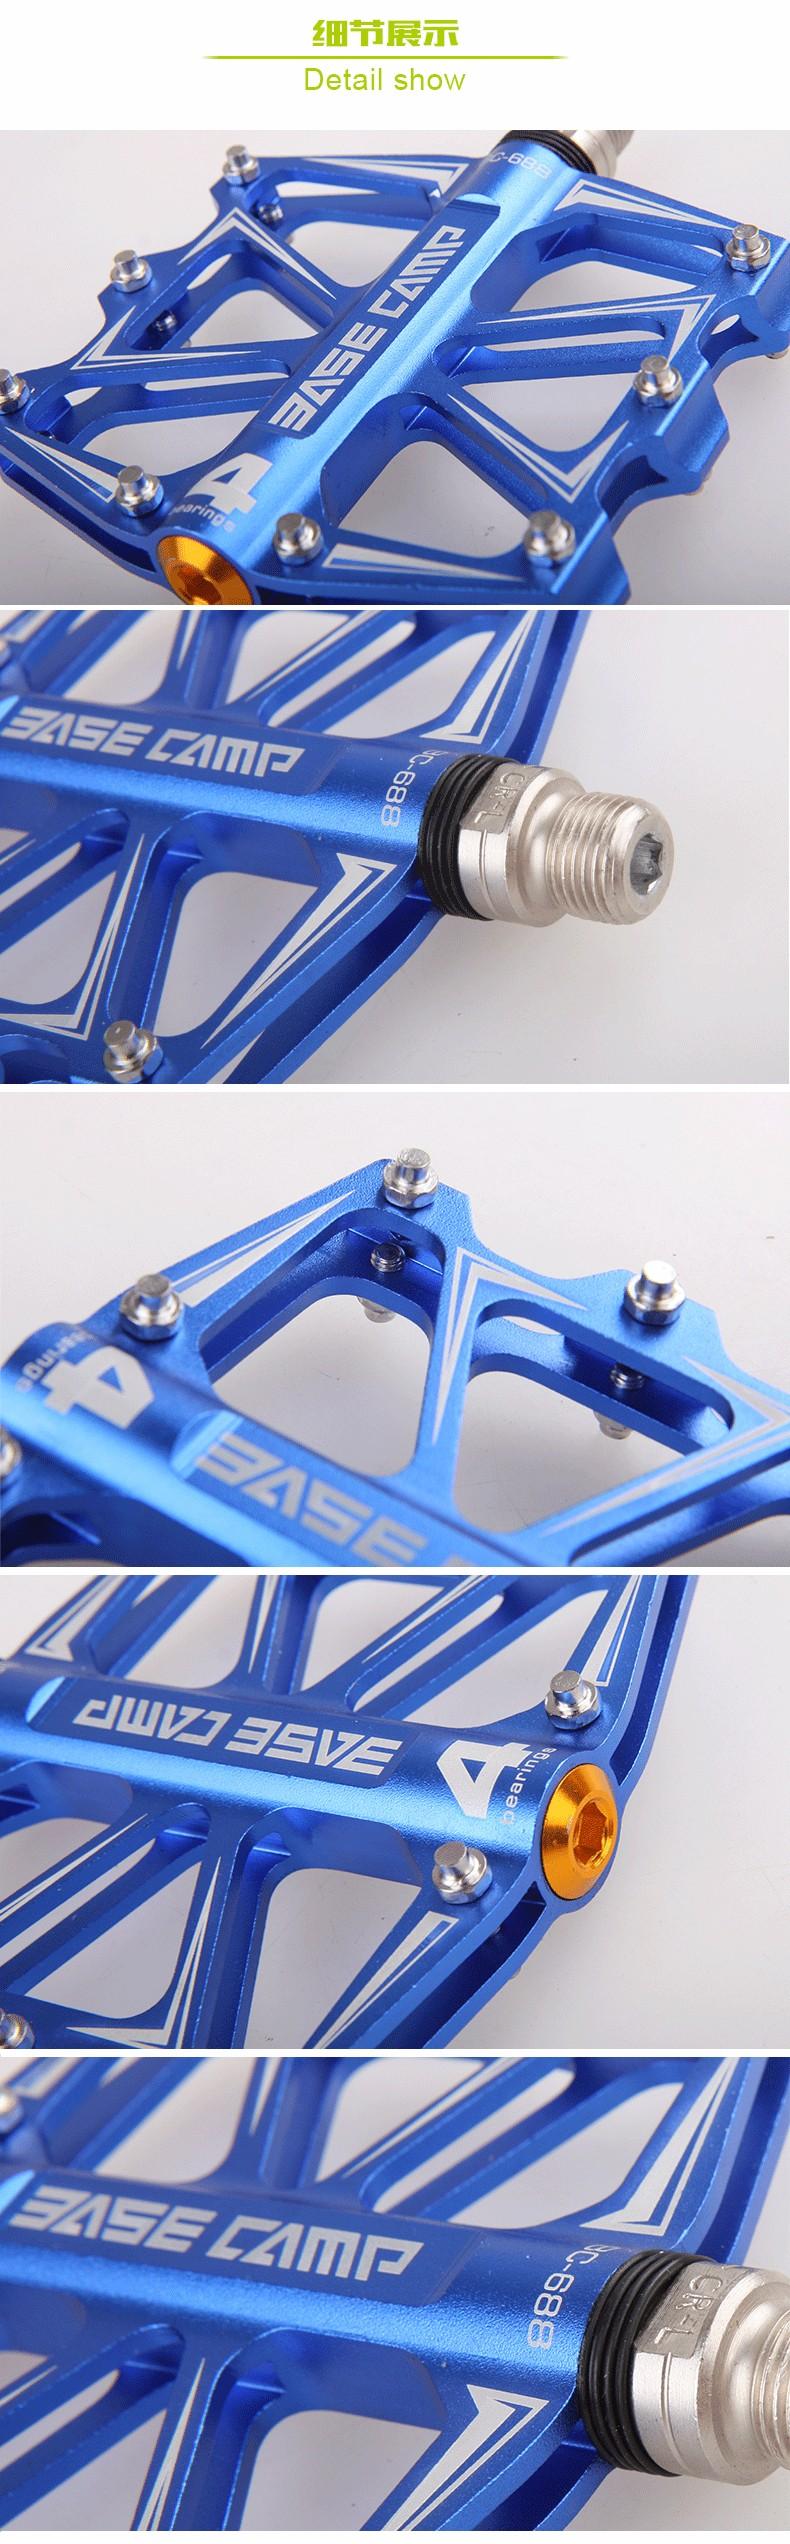 2Pcs MTB Mountain Bike Bycle Padel Ultralight Pedal Magnesium Alloy Pedal 243g